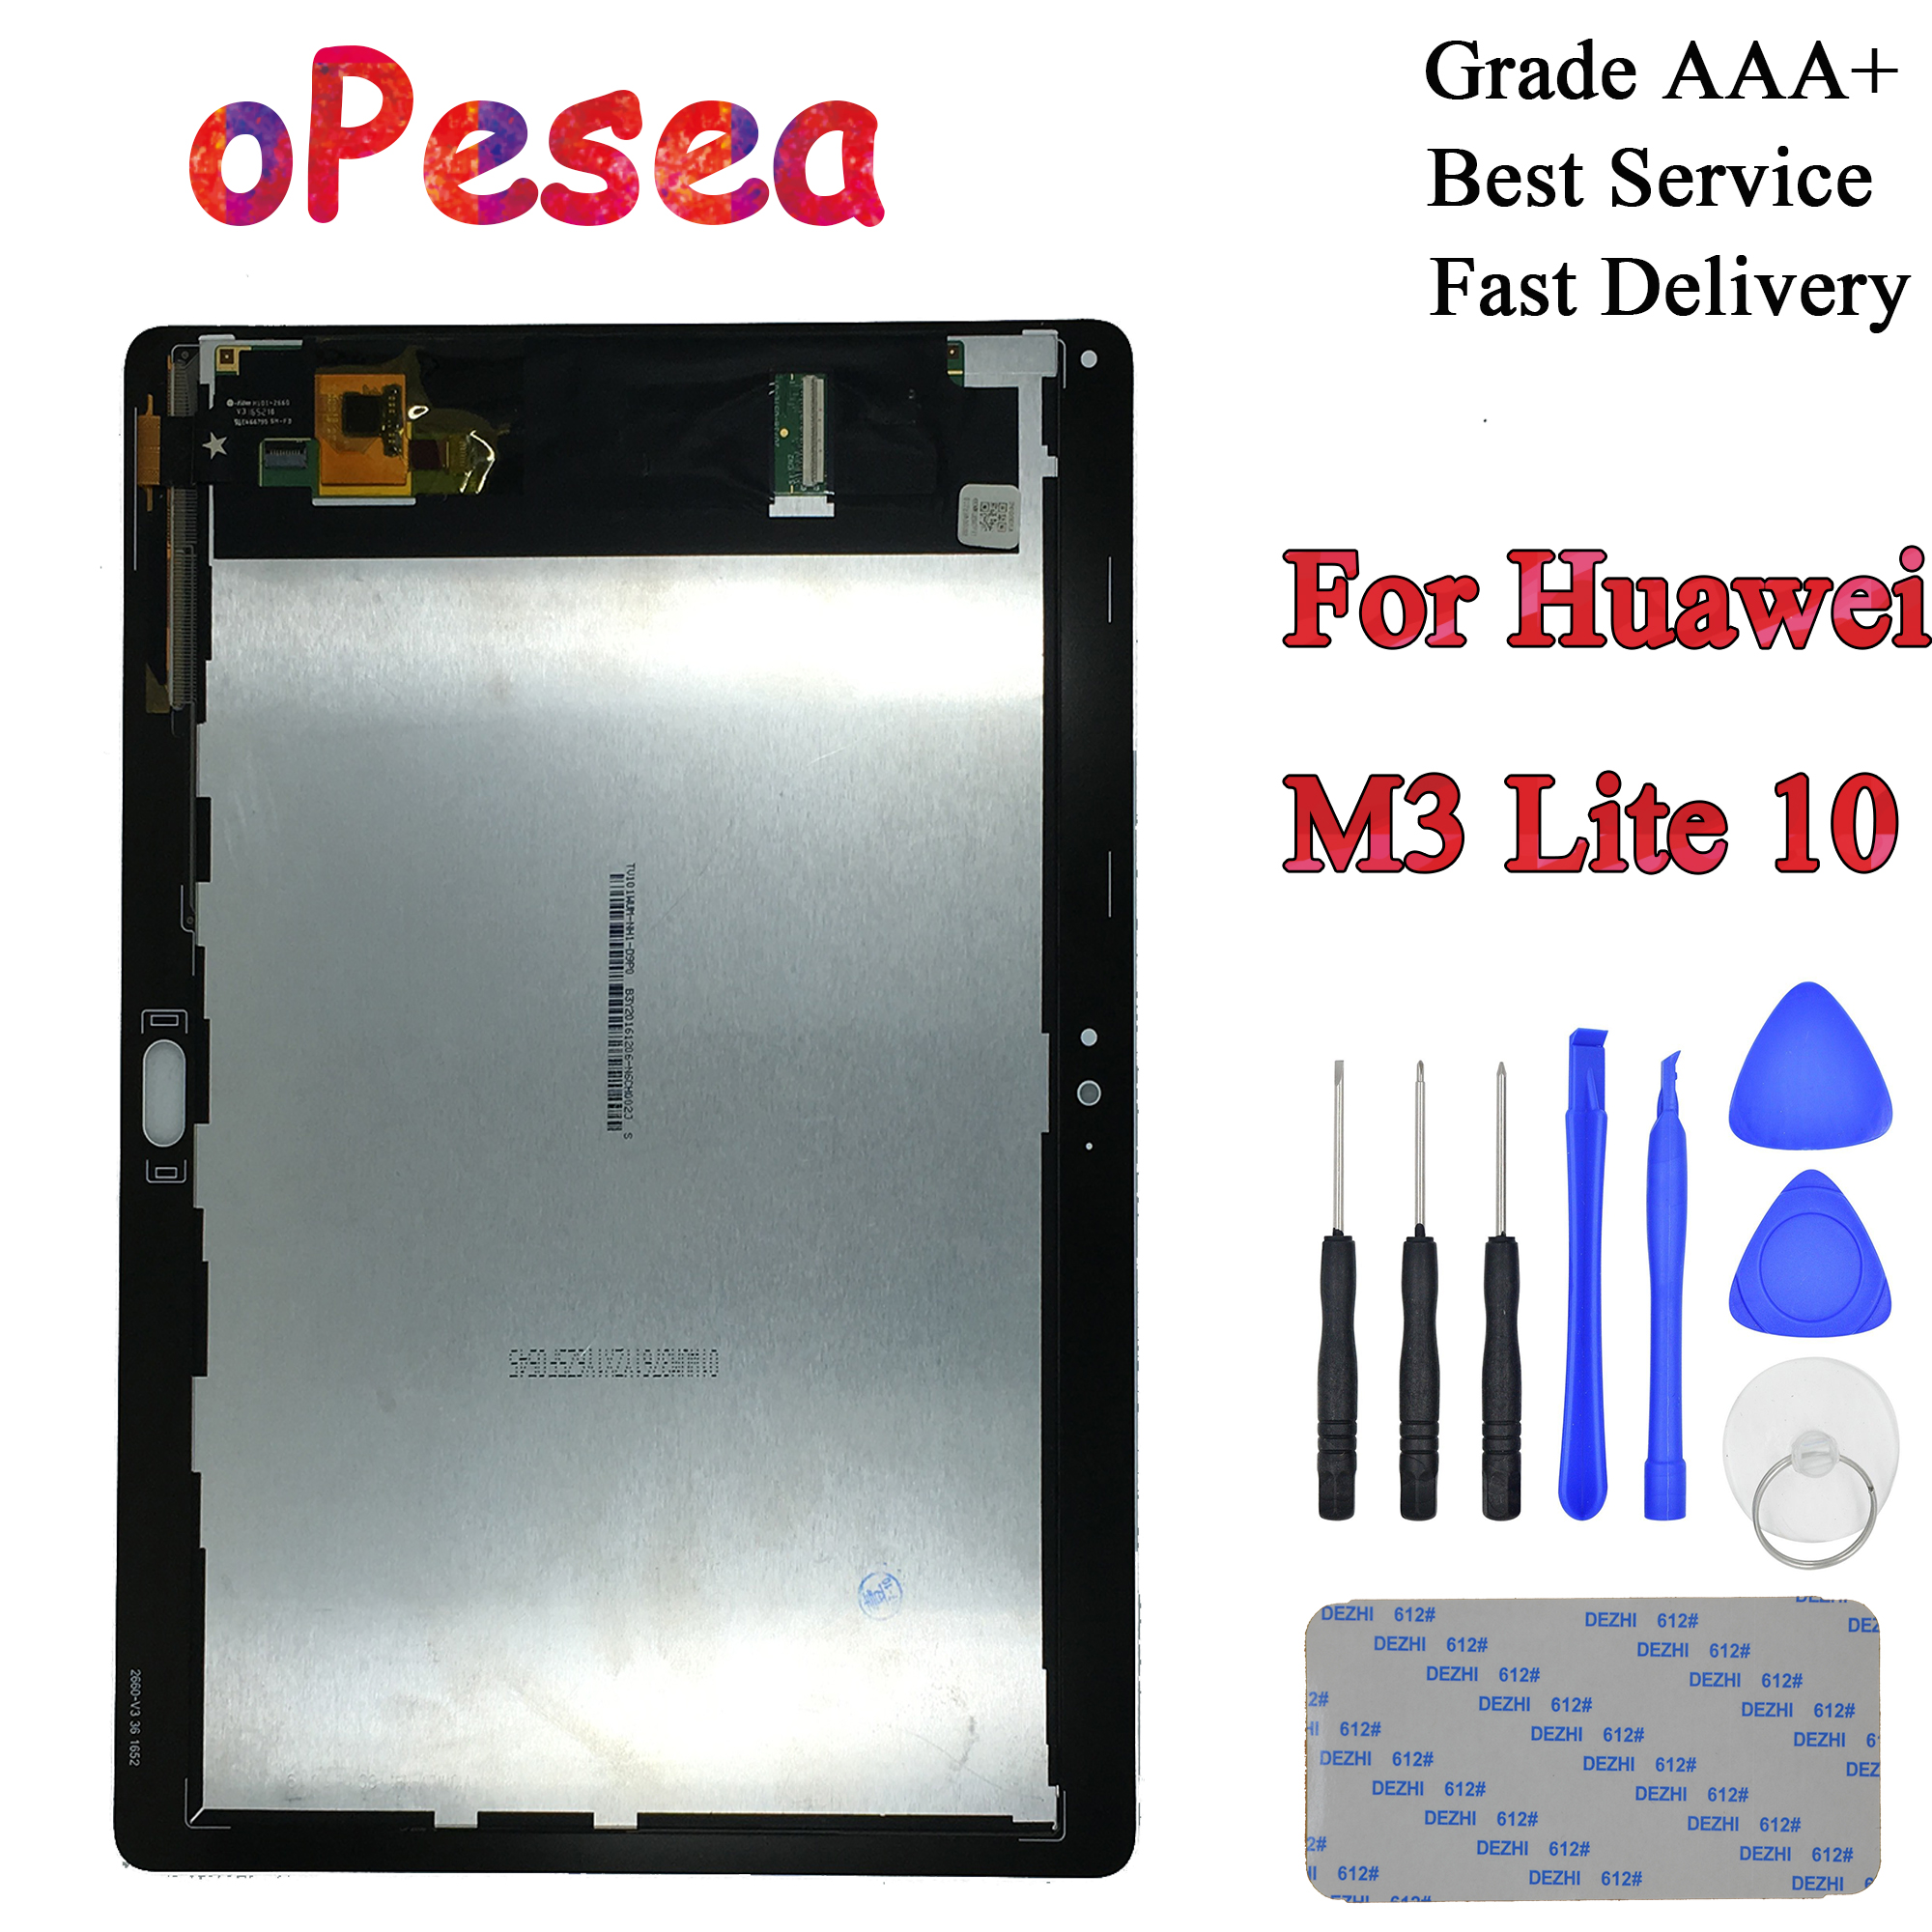 OPesea 10.1'' For Huawei Mediapad M3 Lite 10 BAH-AL00 BAH-W09 BAH-L09 LCD Display Panel Touch Screen Digitizer Glass Assembly